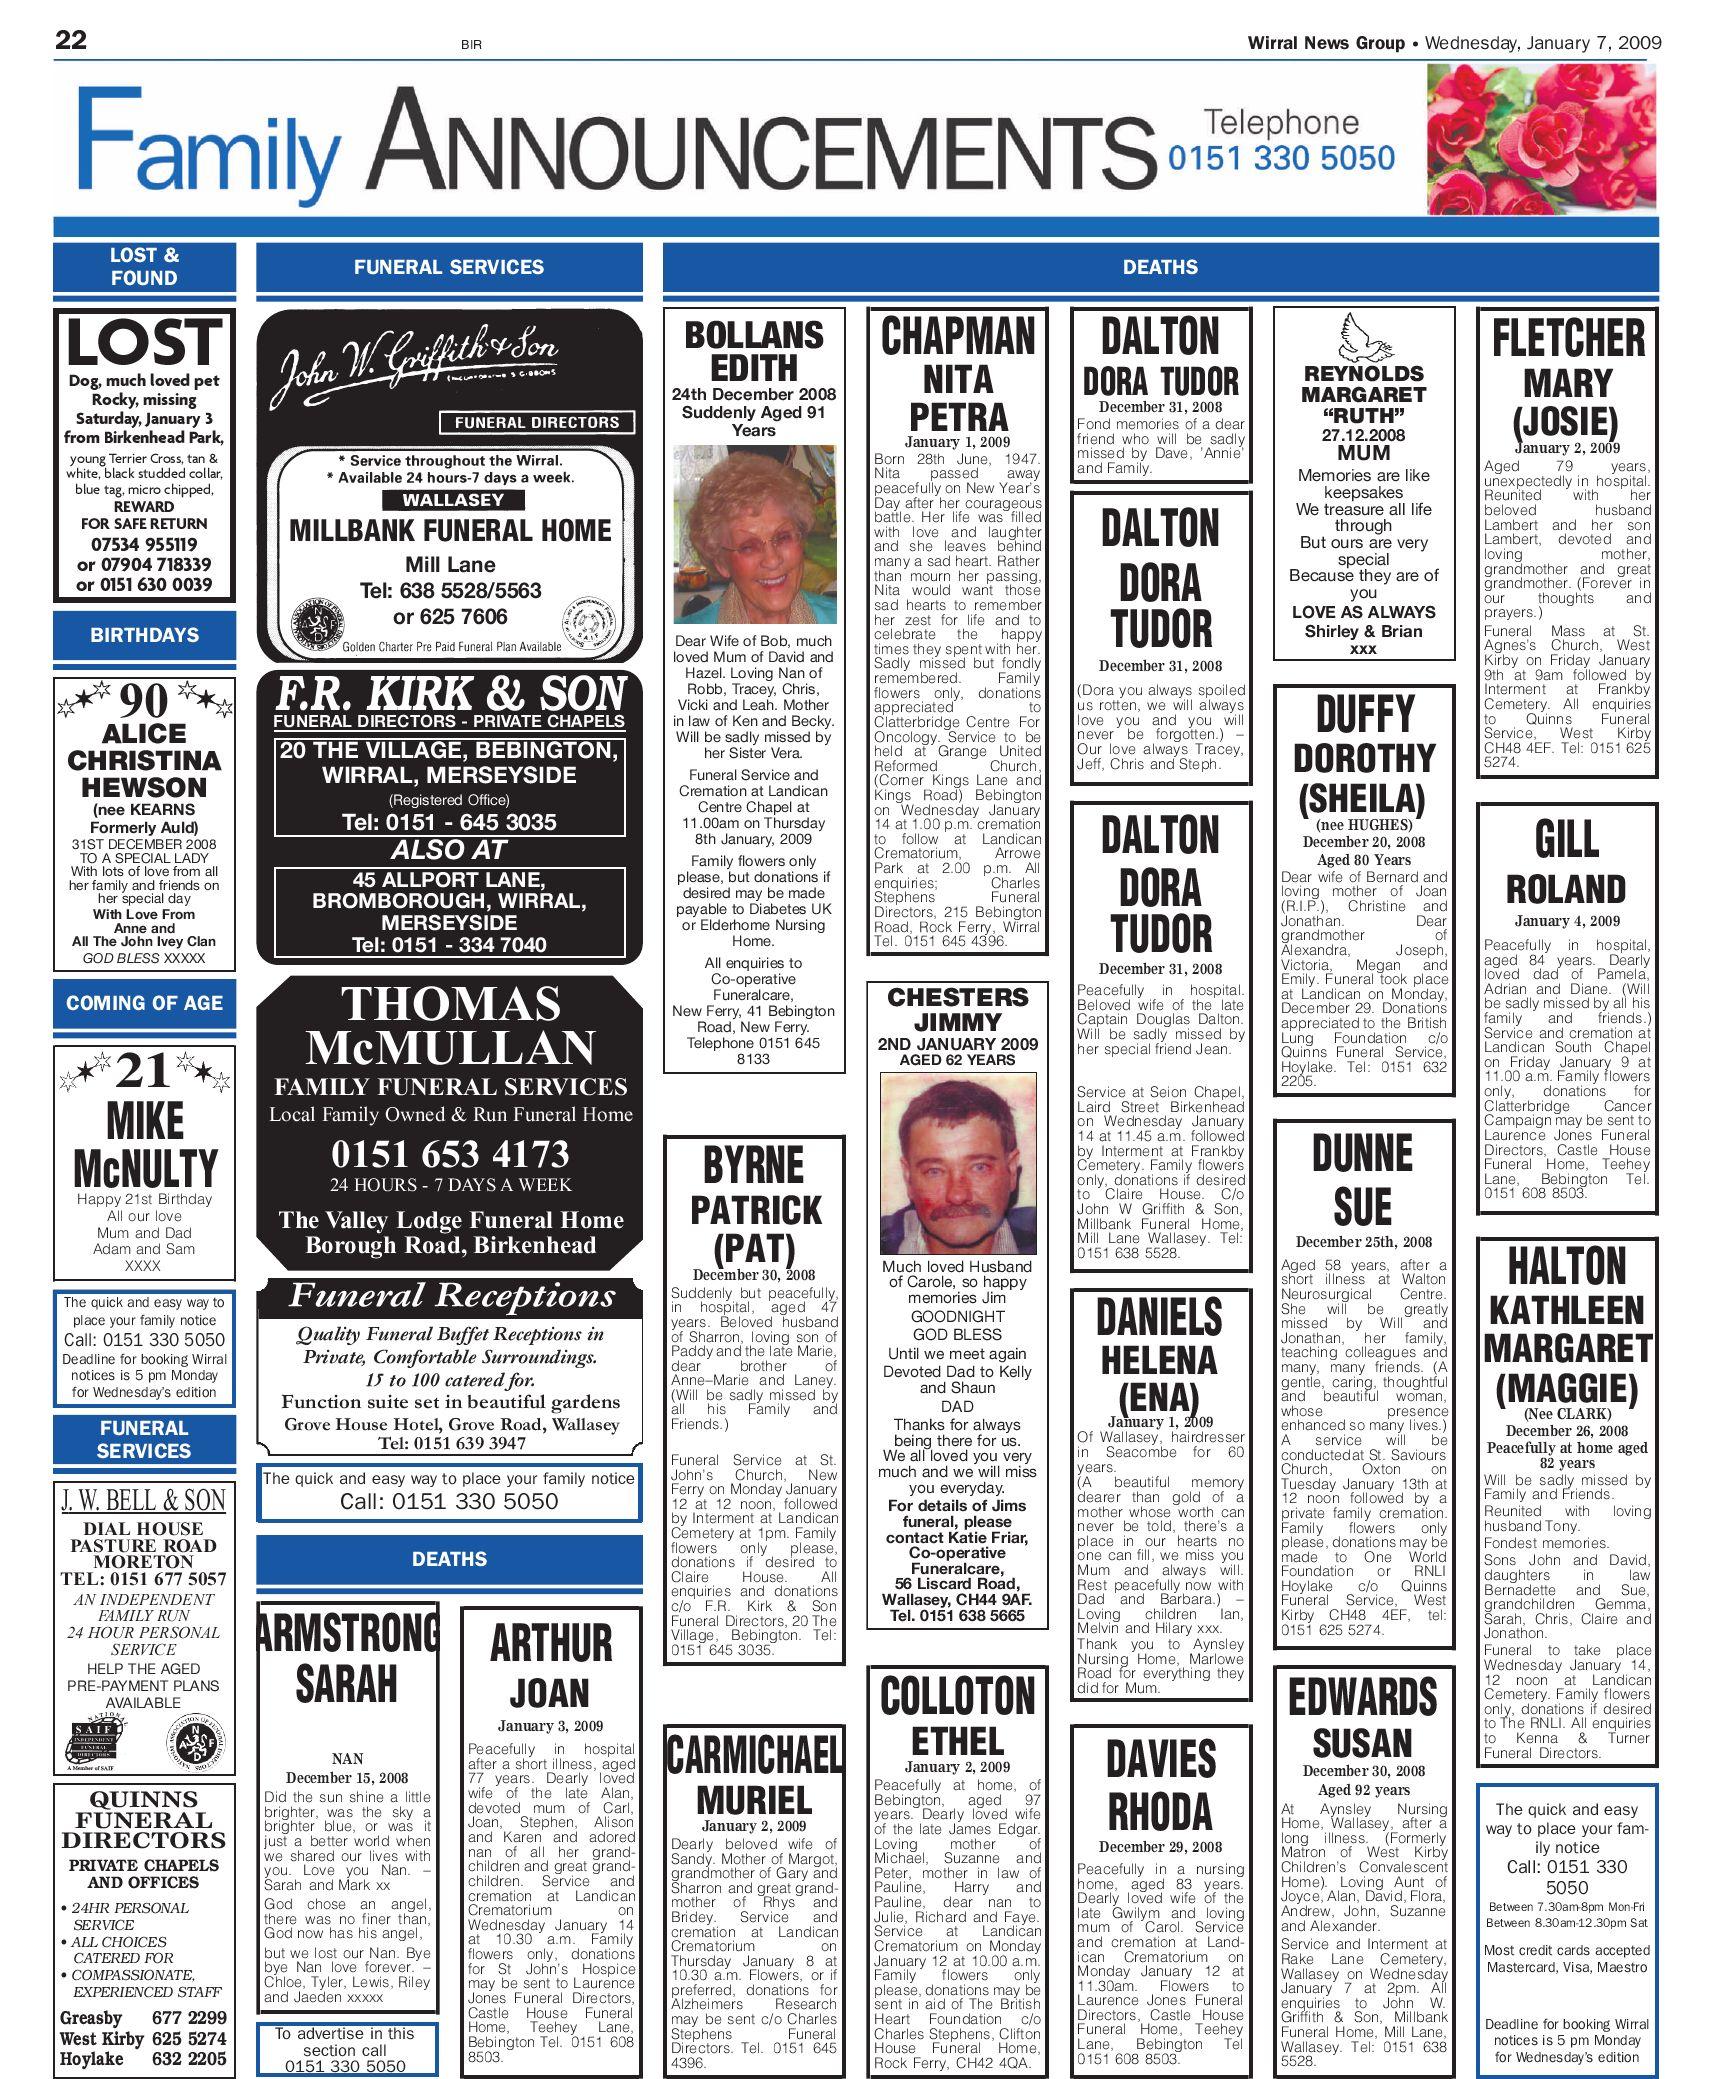 Wirral News Wallasey Edition By Merseysideweeklies V1s1ter Issuu